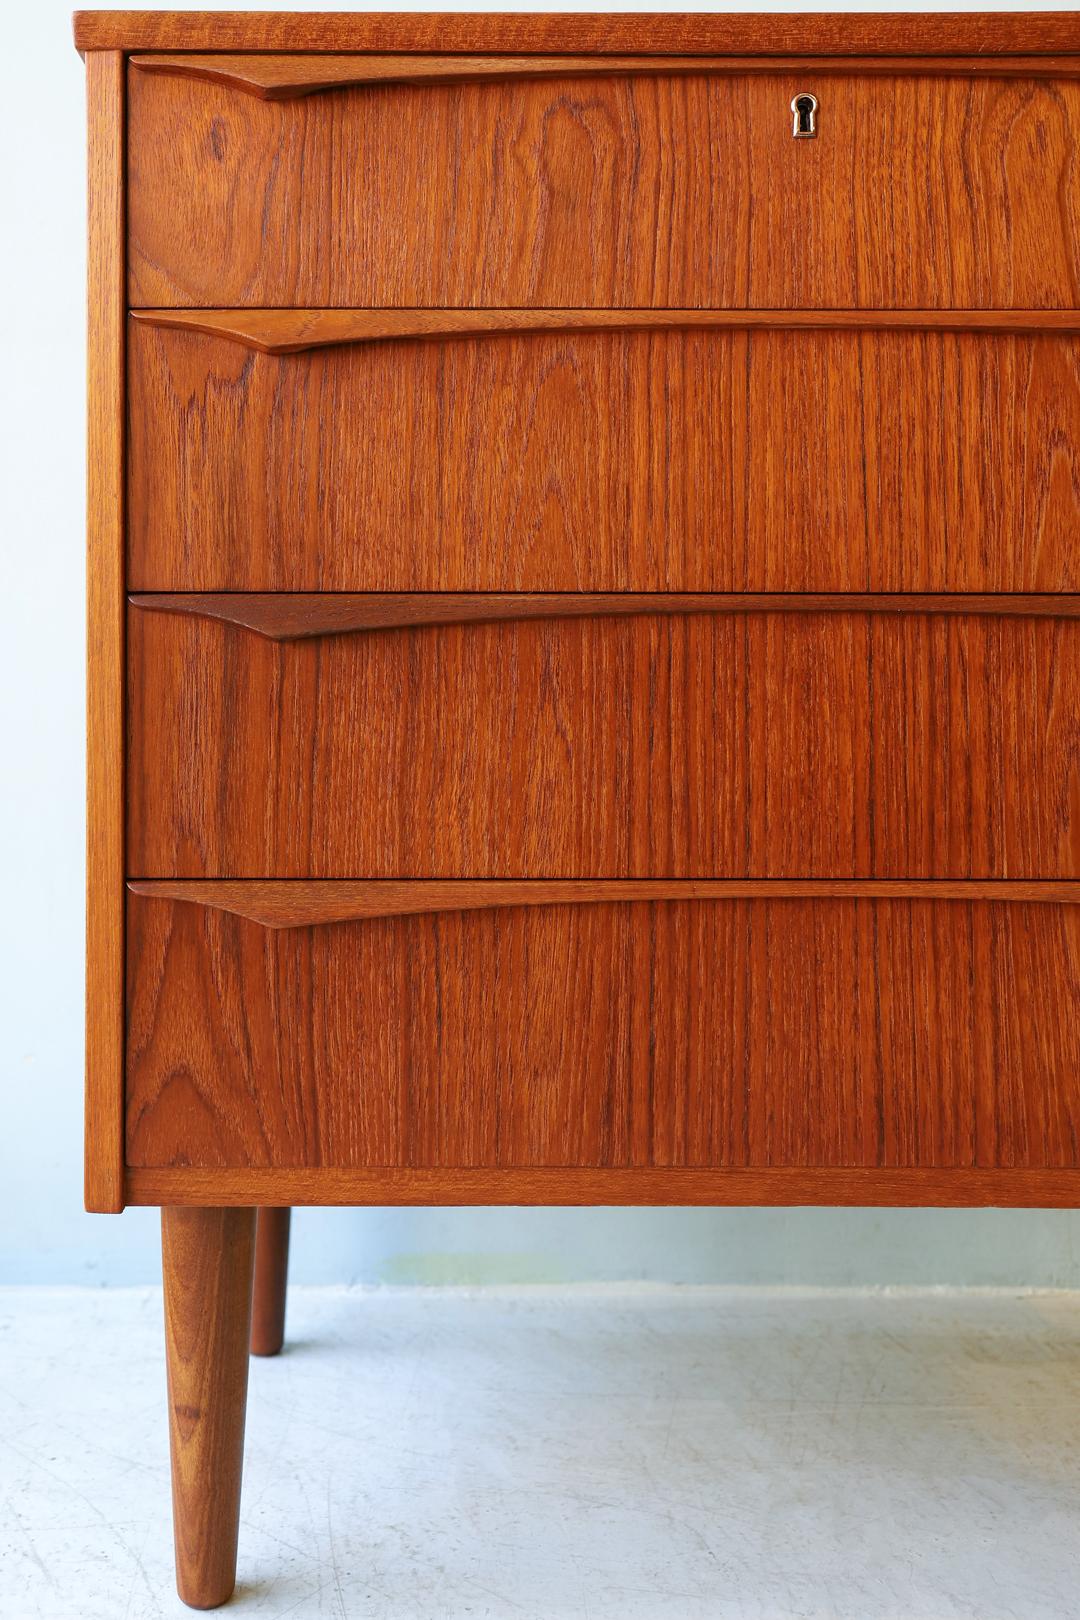 Danish Vintage Teakwood Chest 4Drawers/デンマークヴィンテージ チェスト 4段 チーク材 収納 北欧家具 シンプルモダン